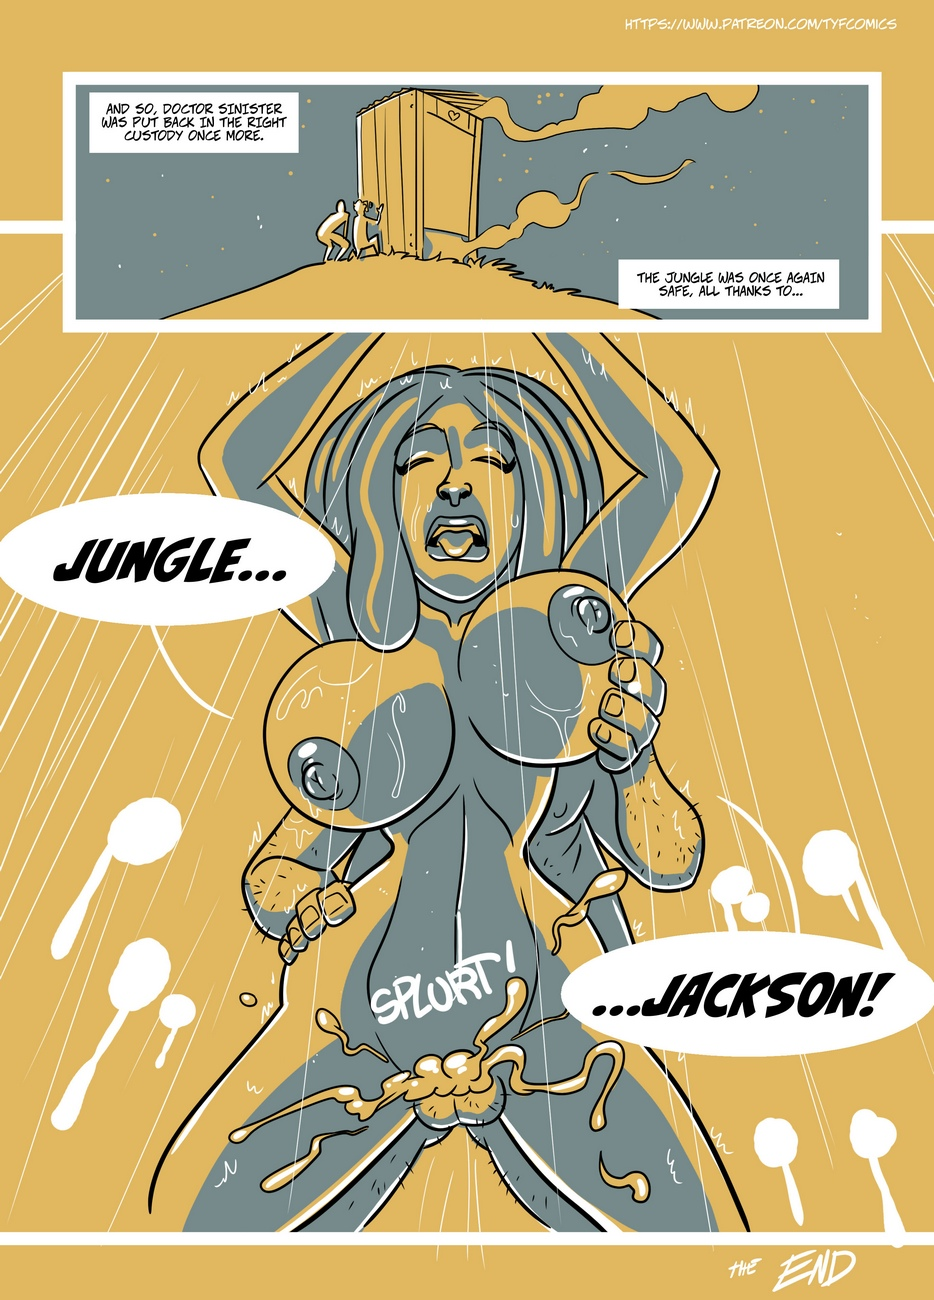 Jungle-Jackson 28 free sex comic